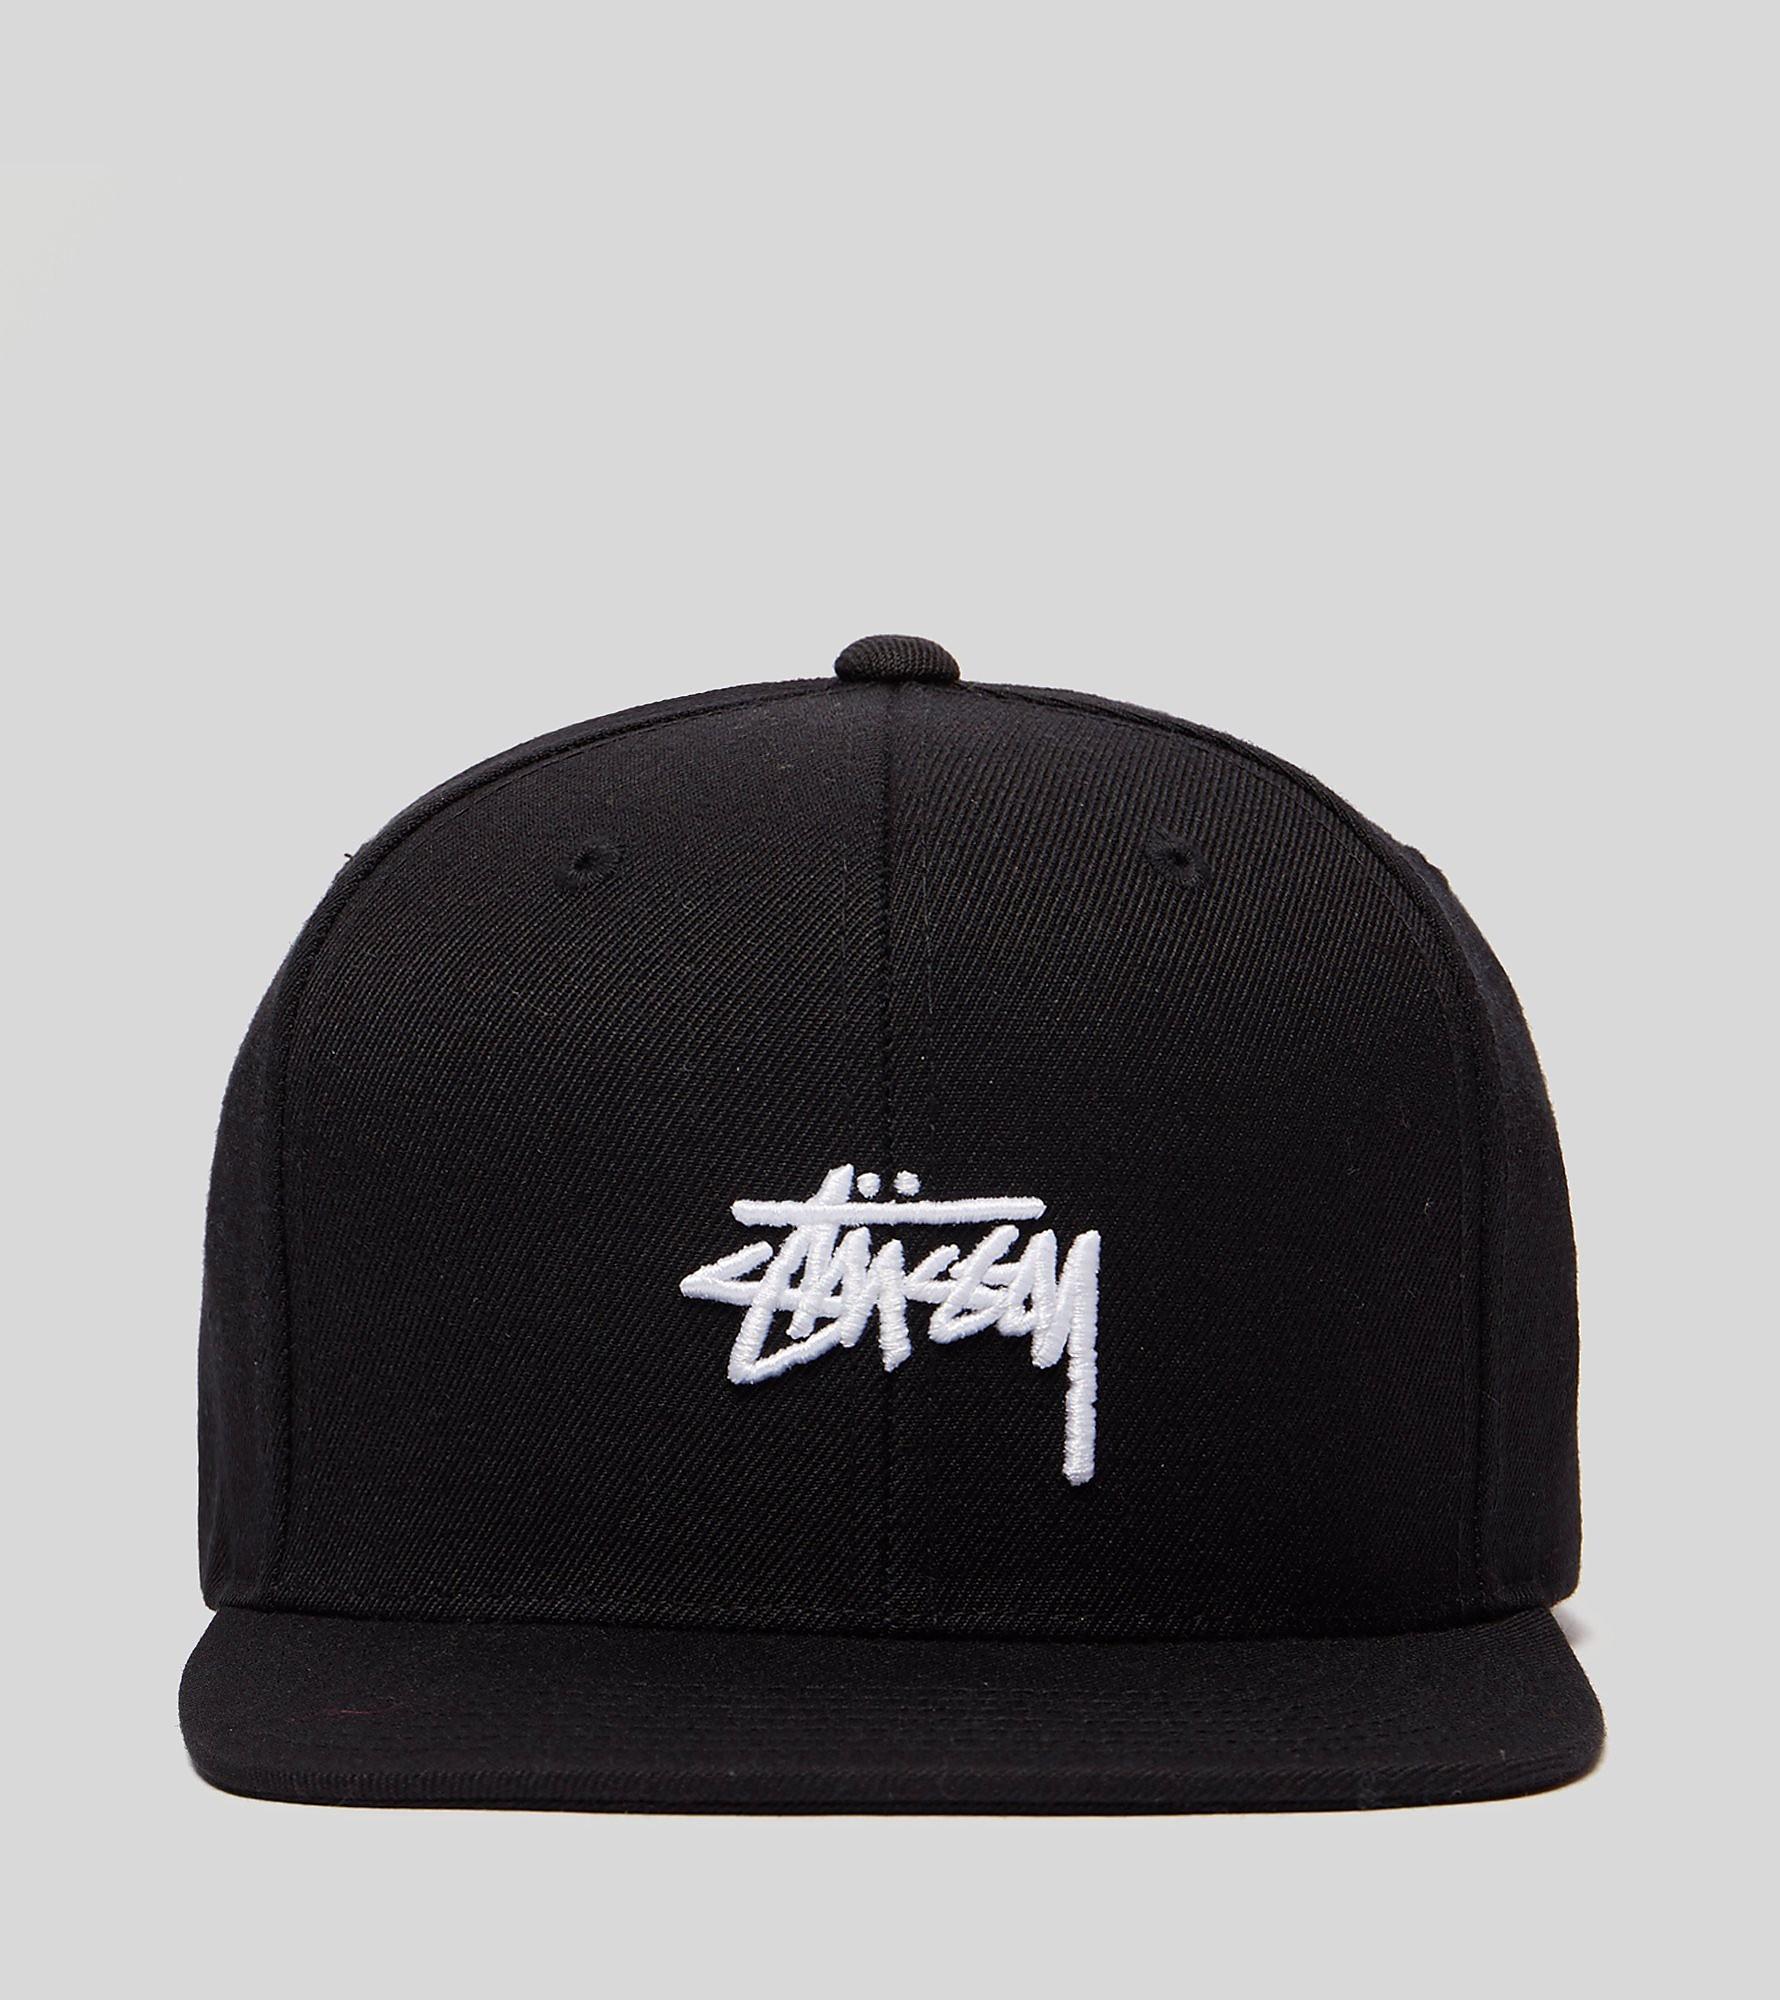 Stussy Stock Hol 17 Snapback Cap